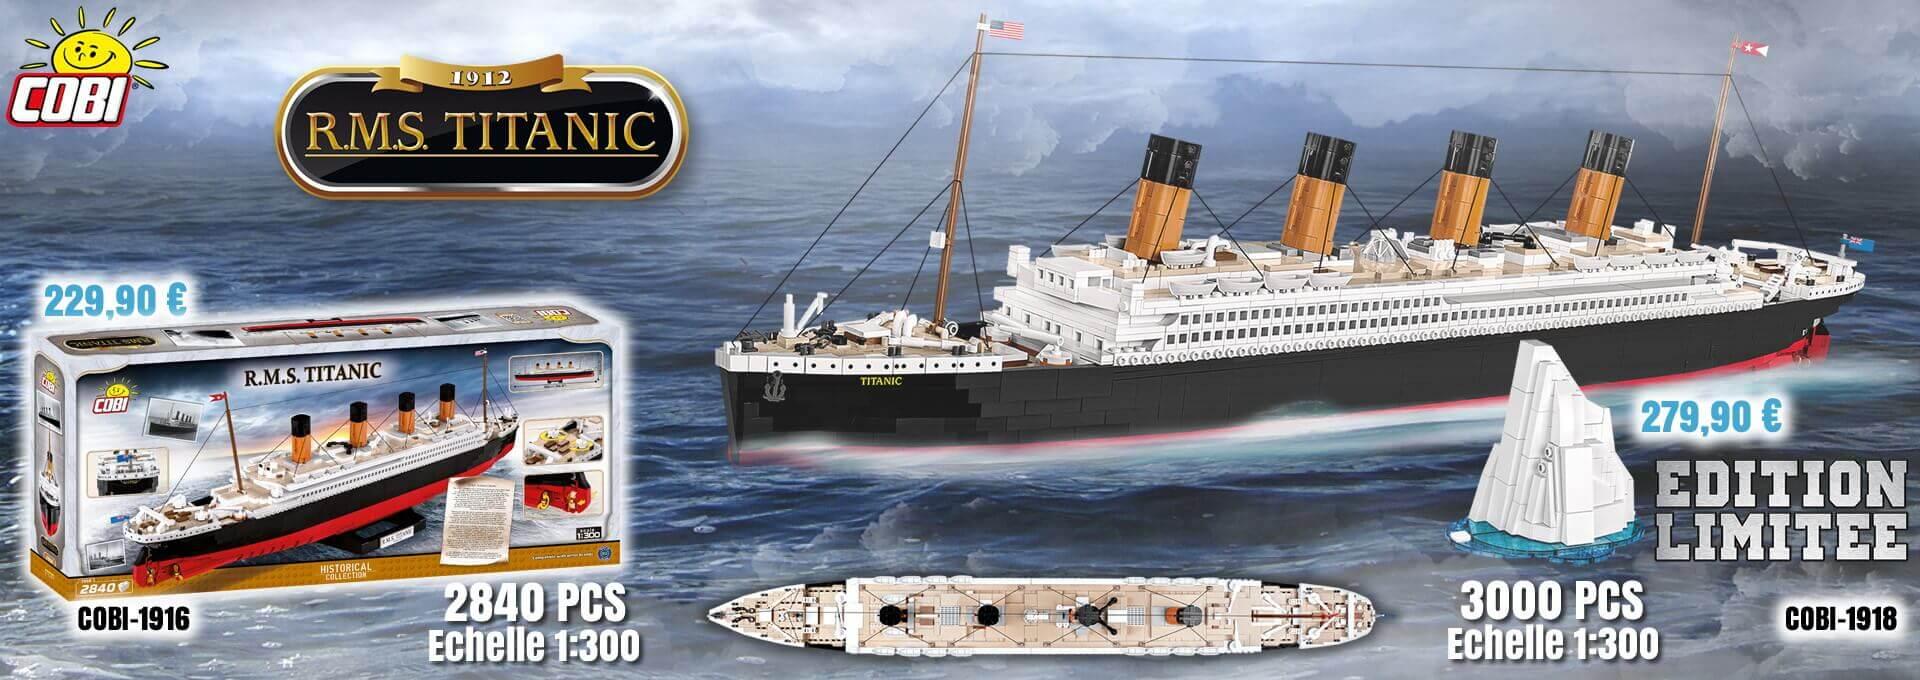 Titanic en Lego - Page 2 Titanic_v2_slider_1920x680